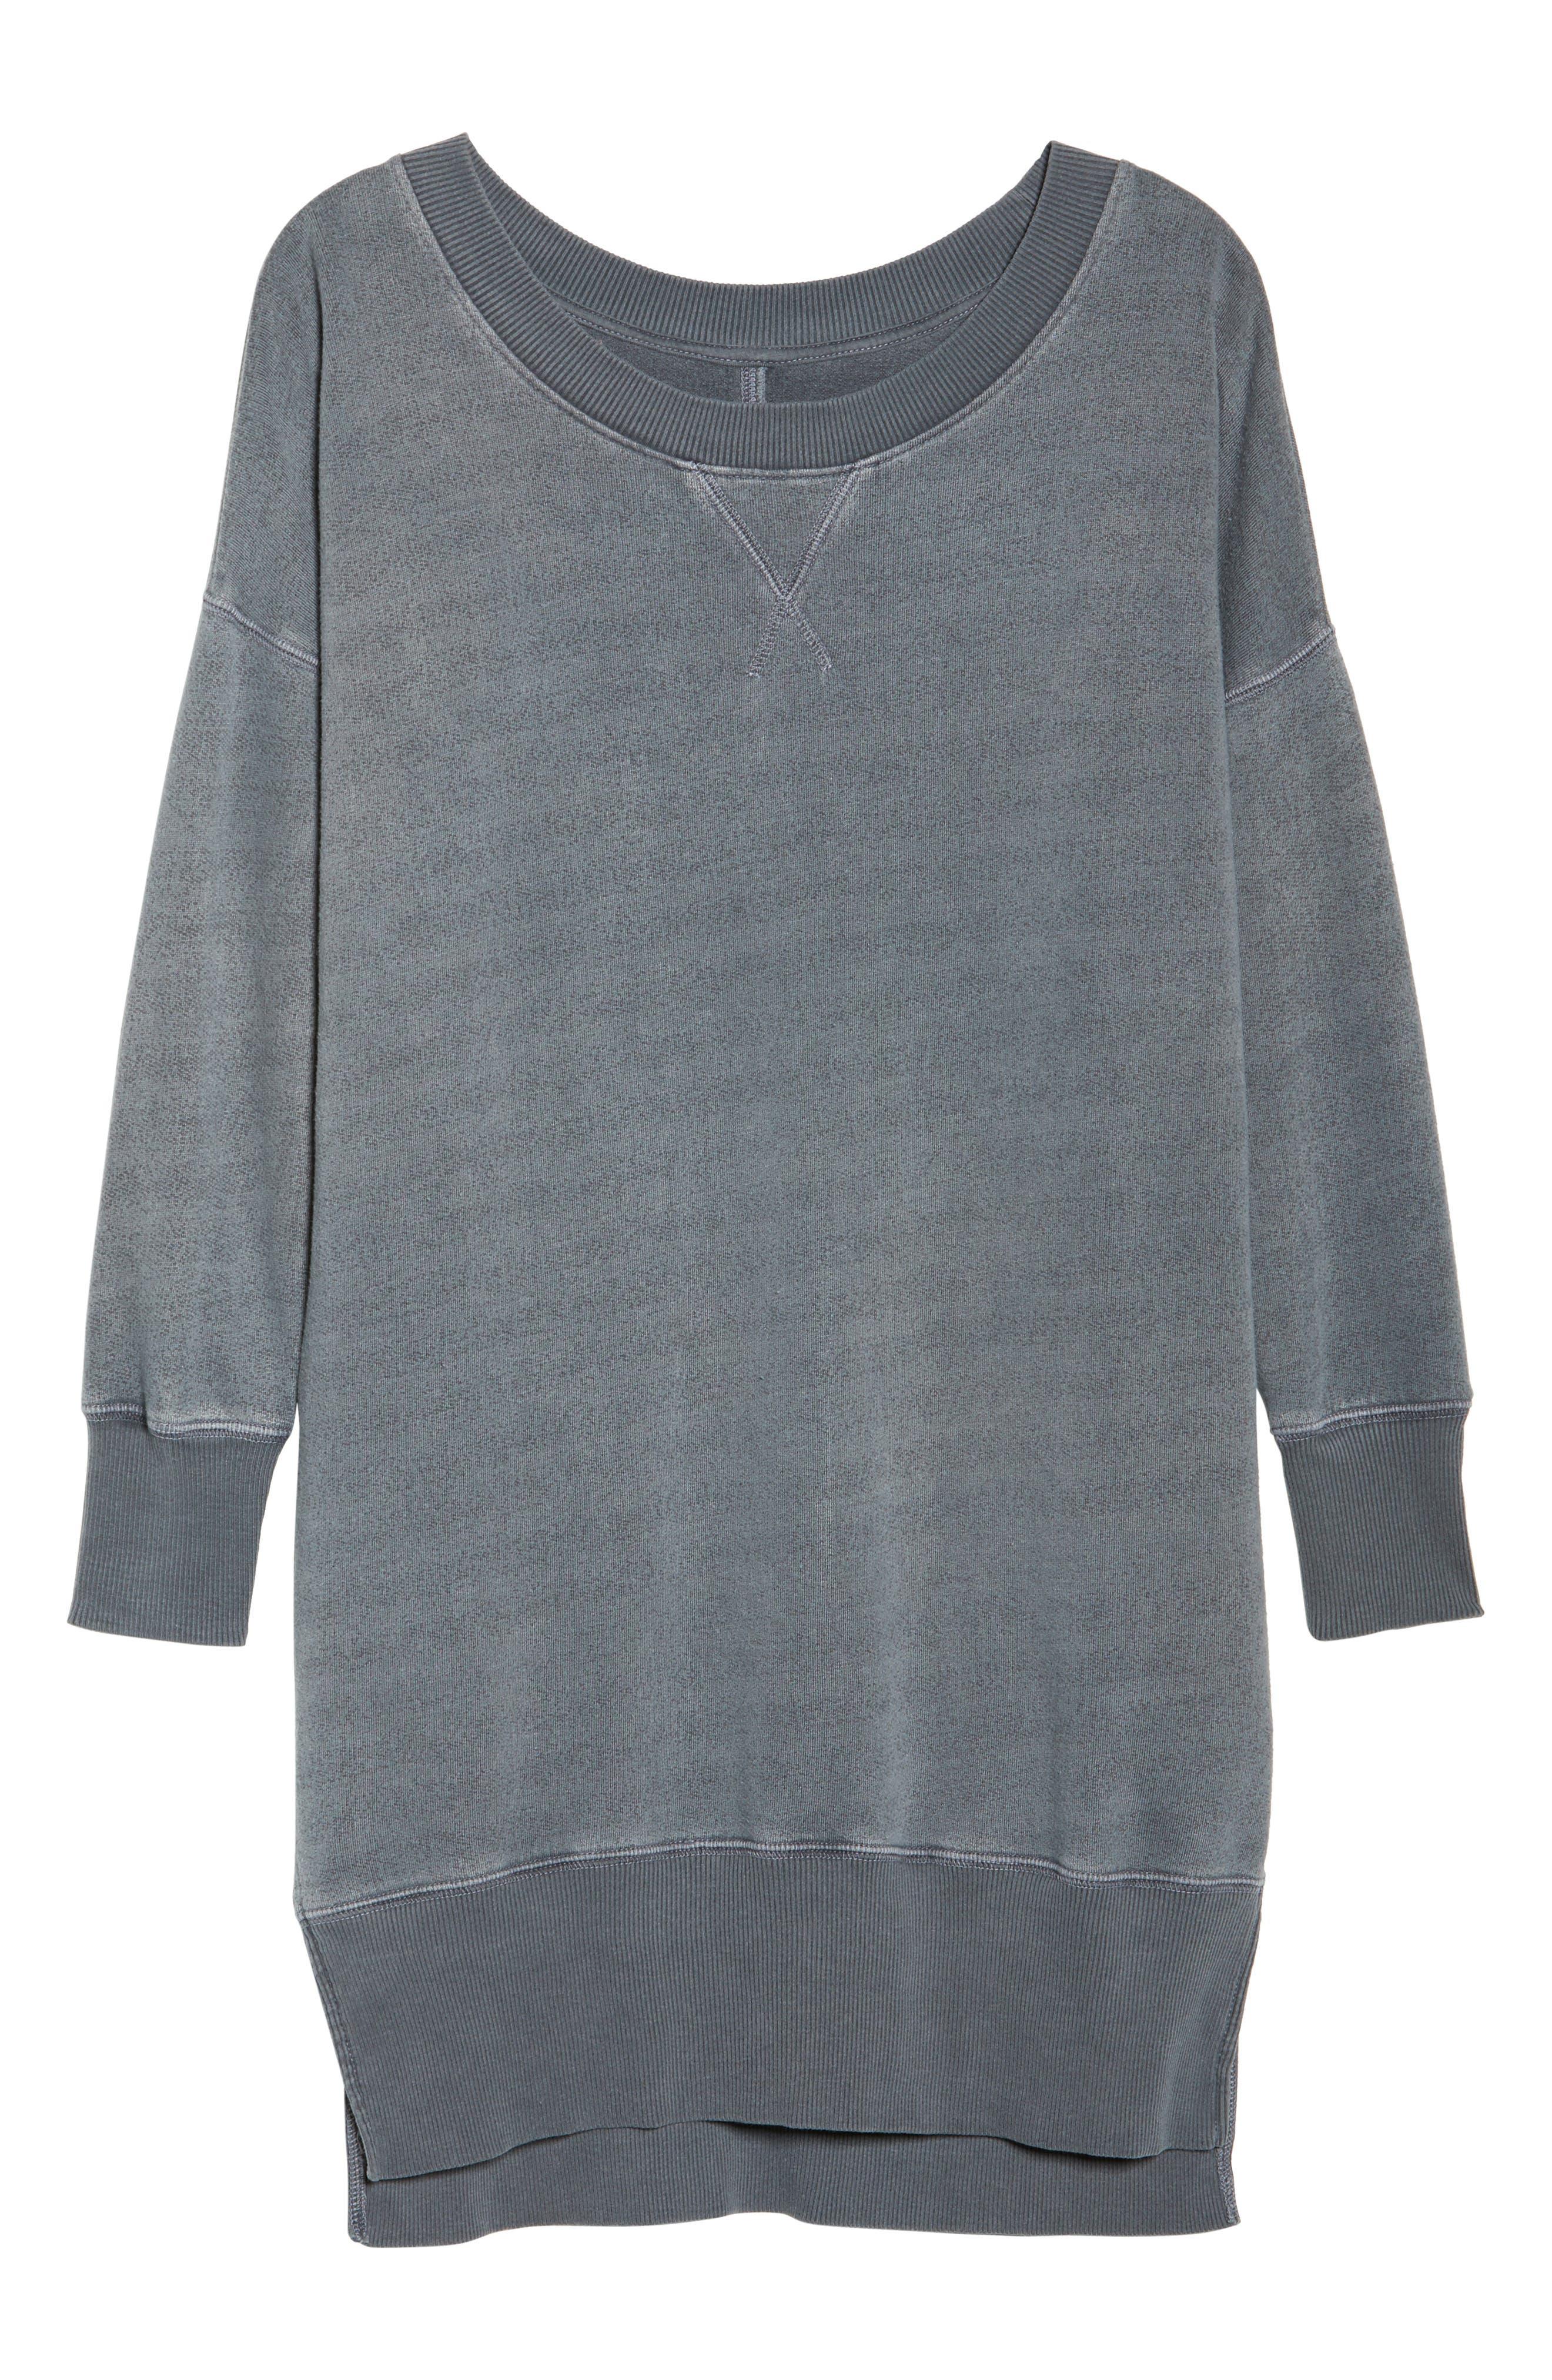 Lounge Sweatshirt Dress,                             Alternate thumbnail 4, color,                             Faded Black